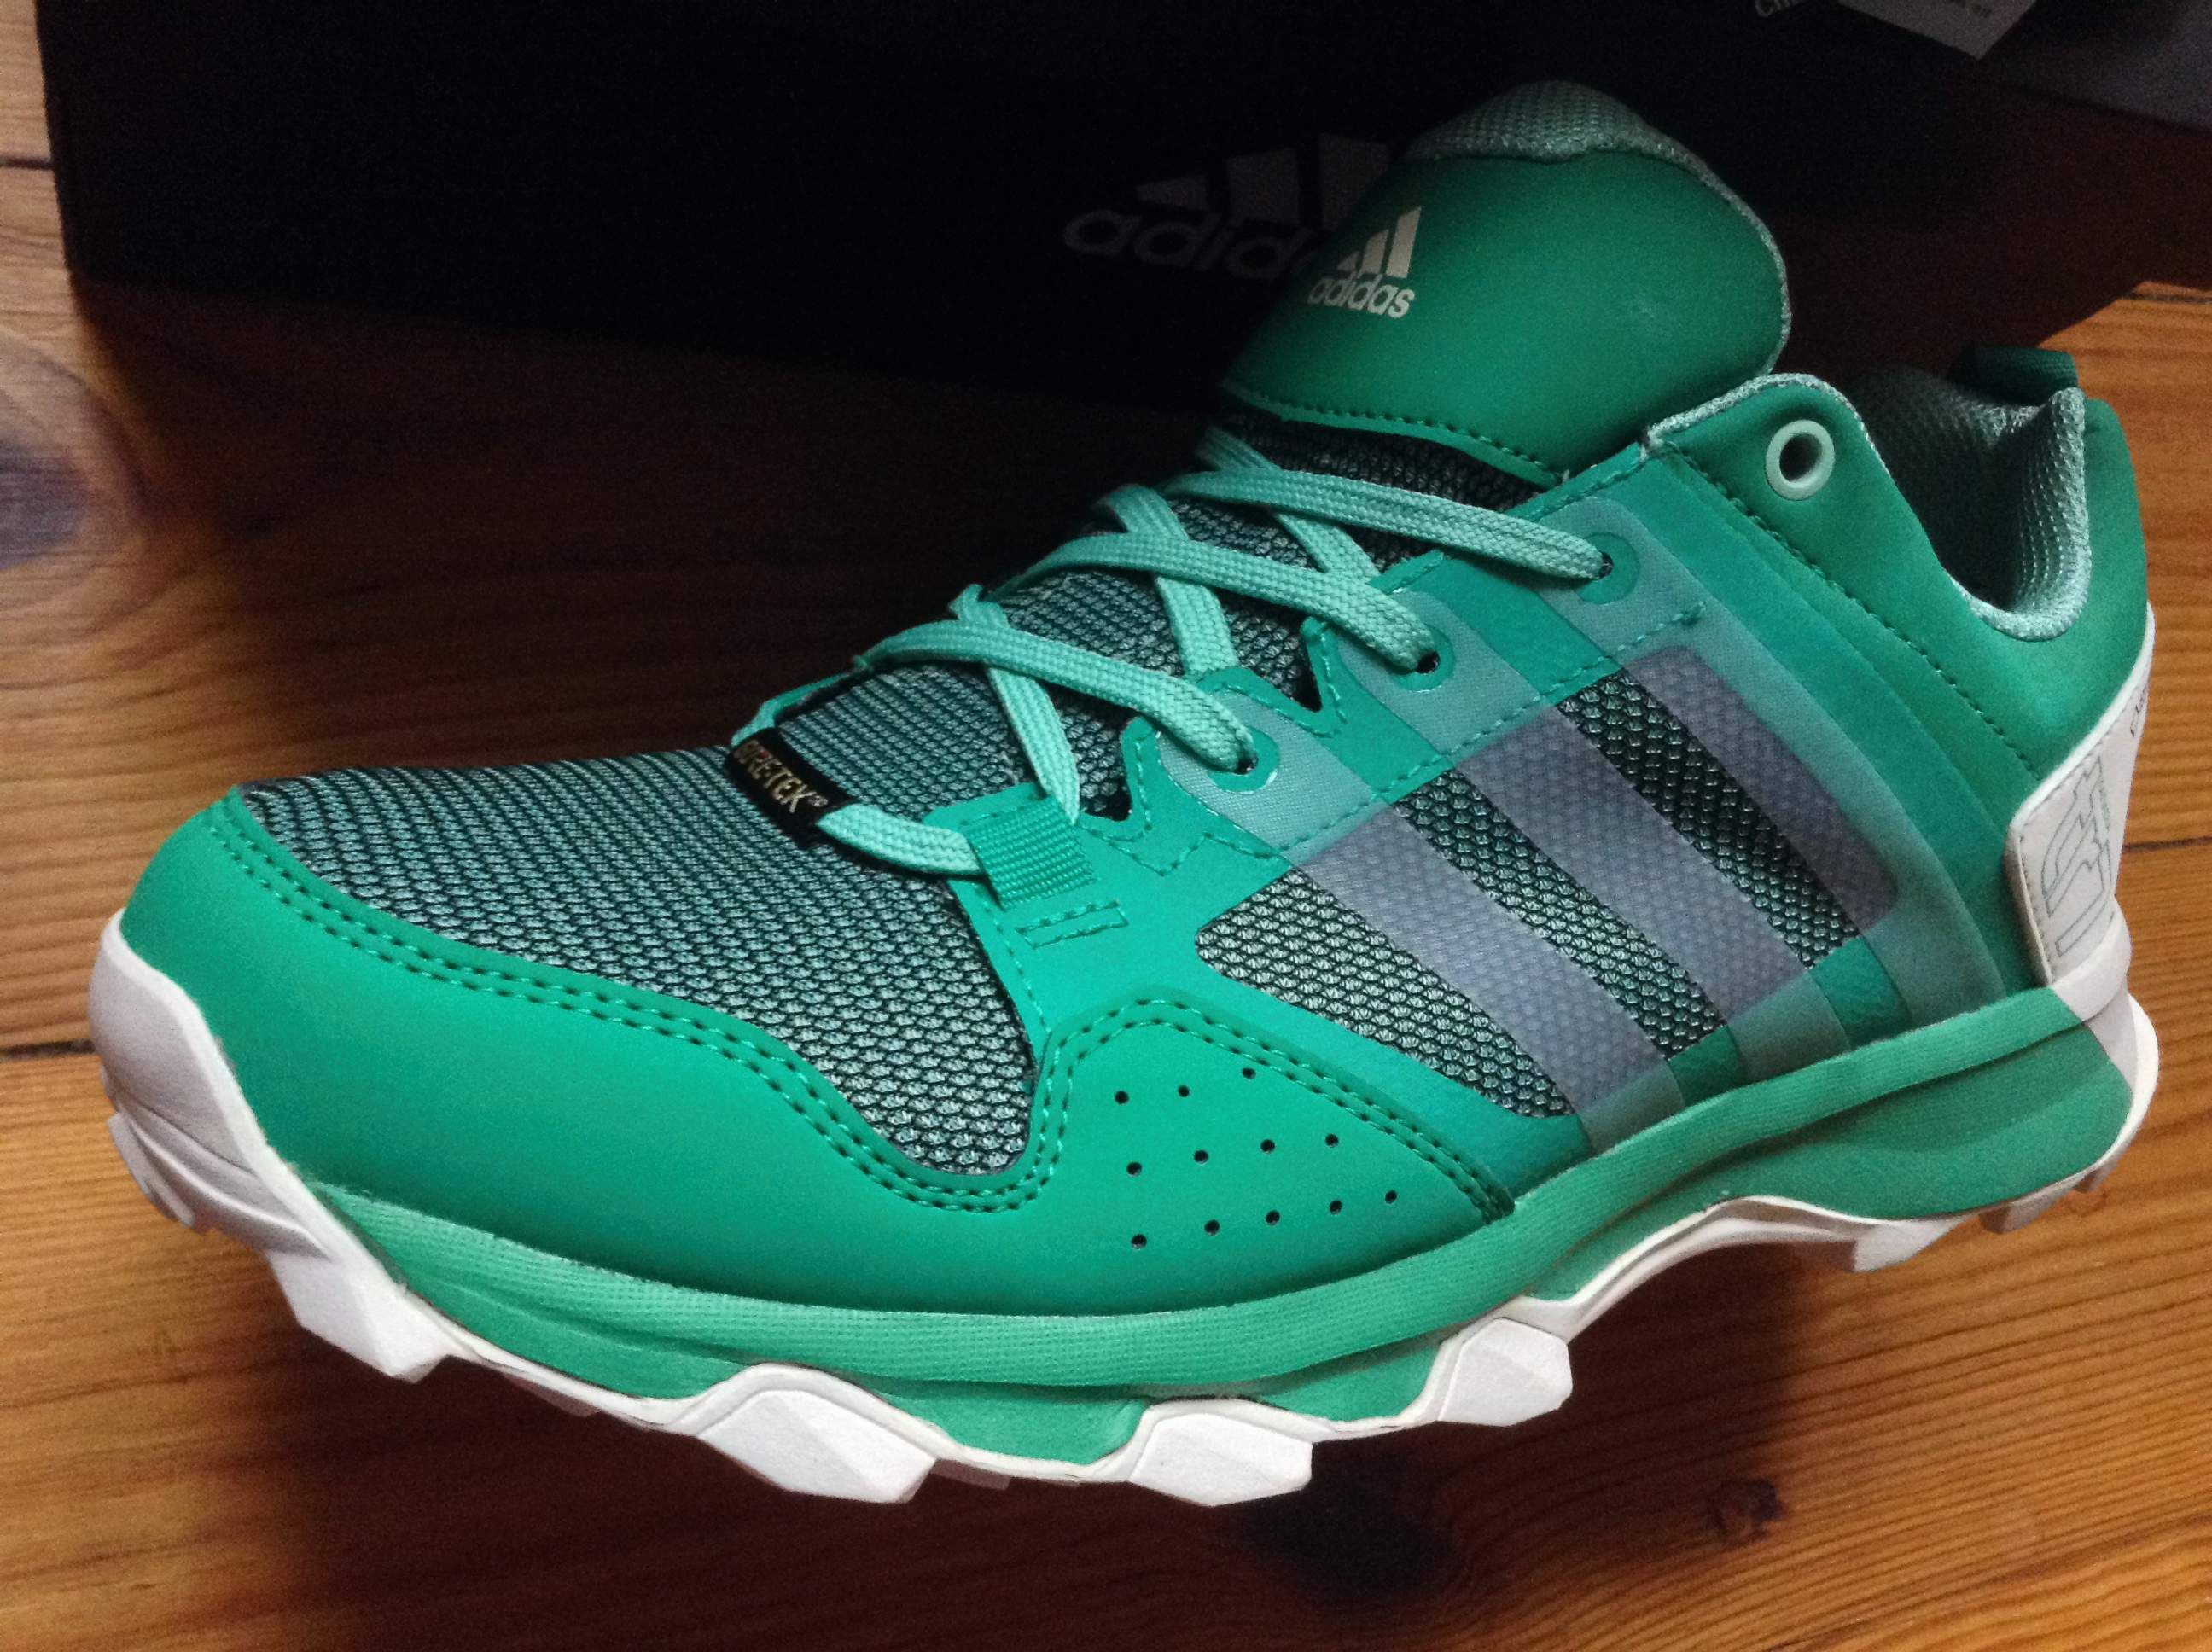 Adidas Kanadia 7 TR (Trail) GORETEX Multisportschuhe   Trail